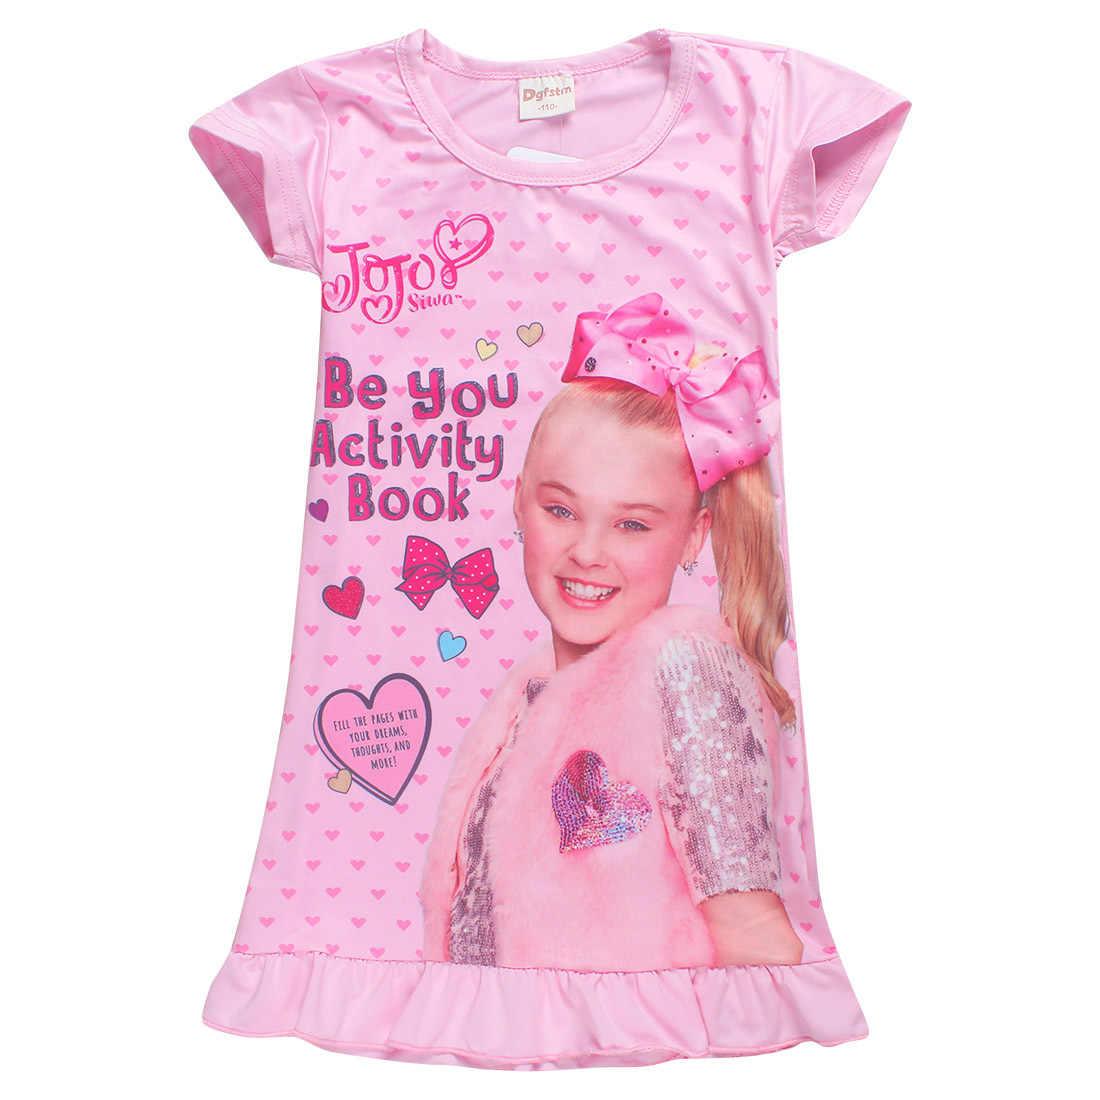 New Summer Jojo Siwa Dresses For Girls Dress Kids Clothes Sleepwear Princess Birthday Party Hair Bow